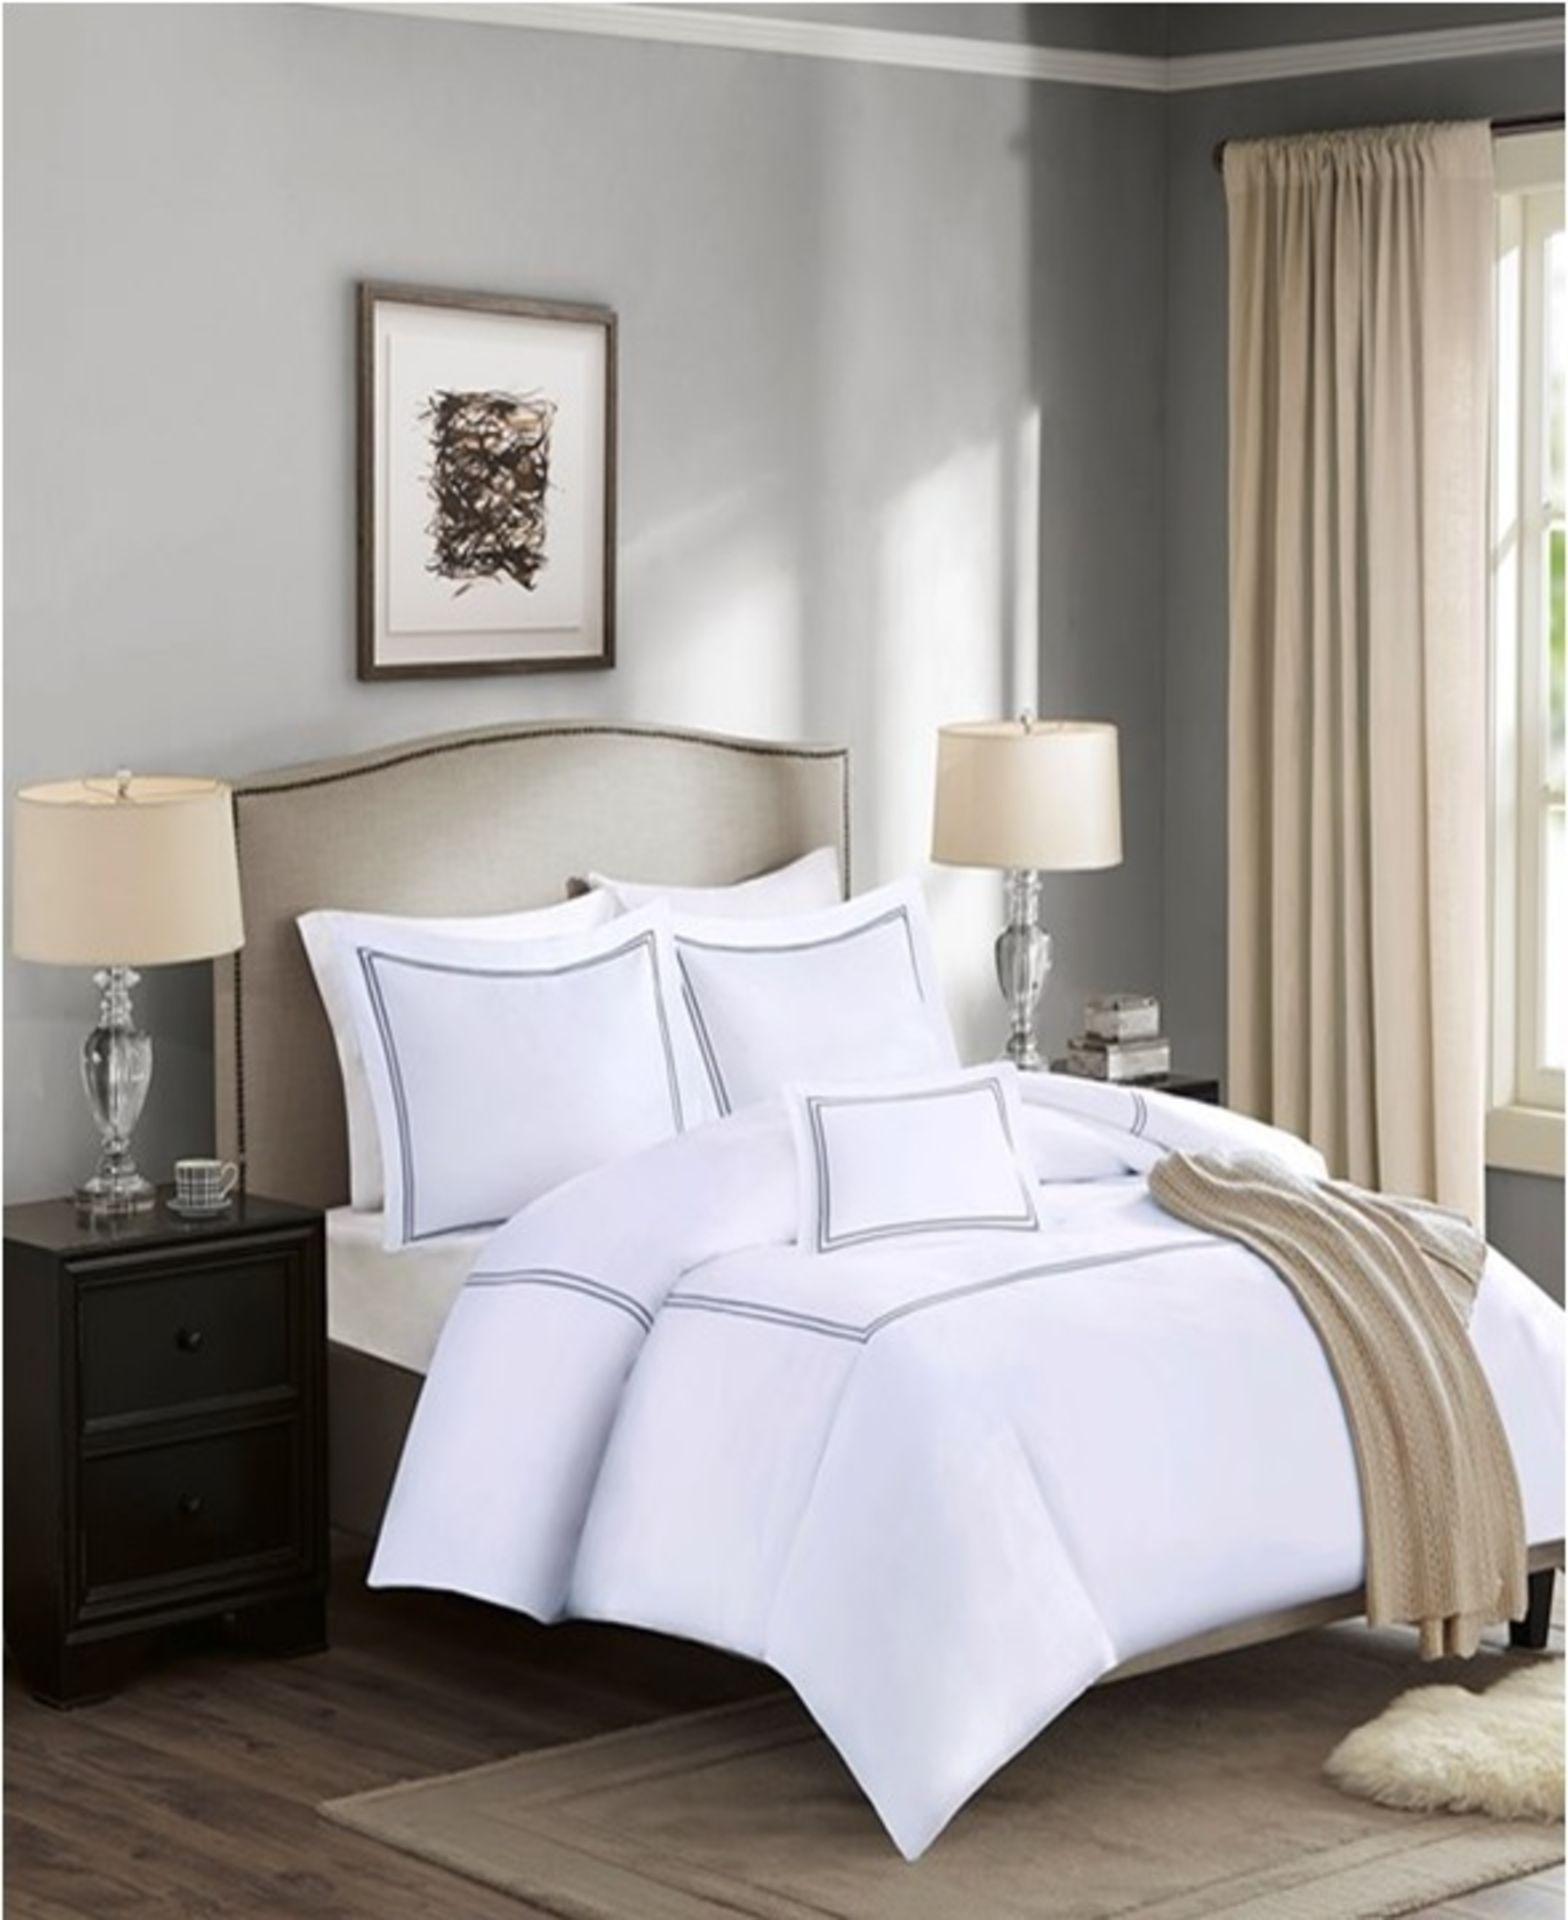 Lot 158 - 1 x Madison Park Luxury Collection King Duvet Set White - Product Code MP12-0199UK (Brand New -